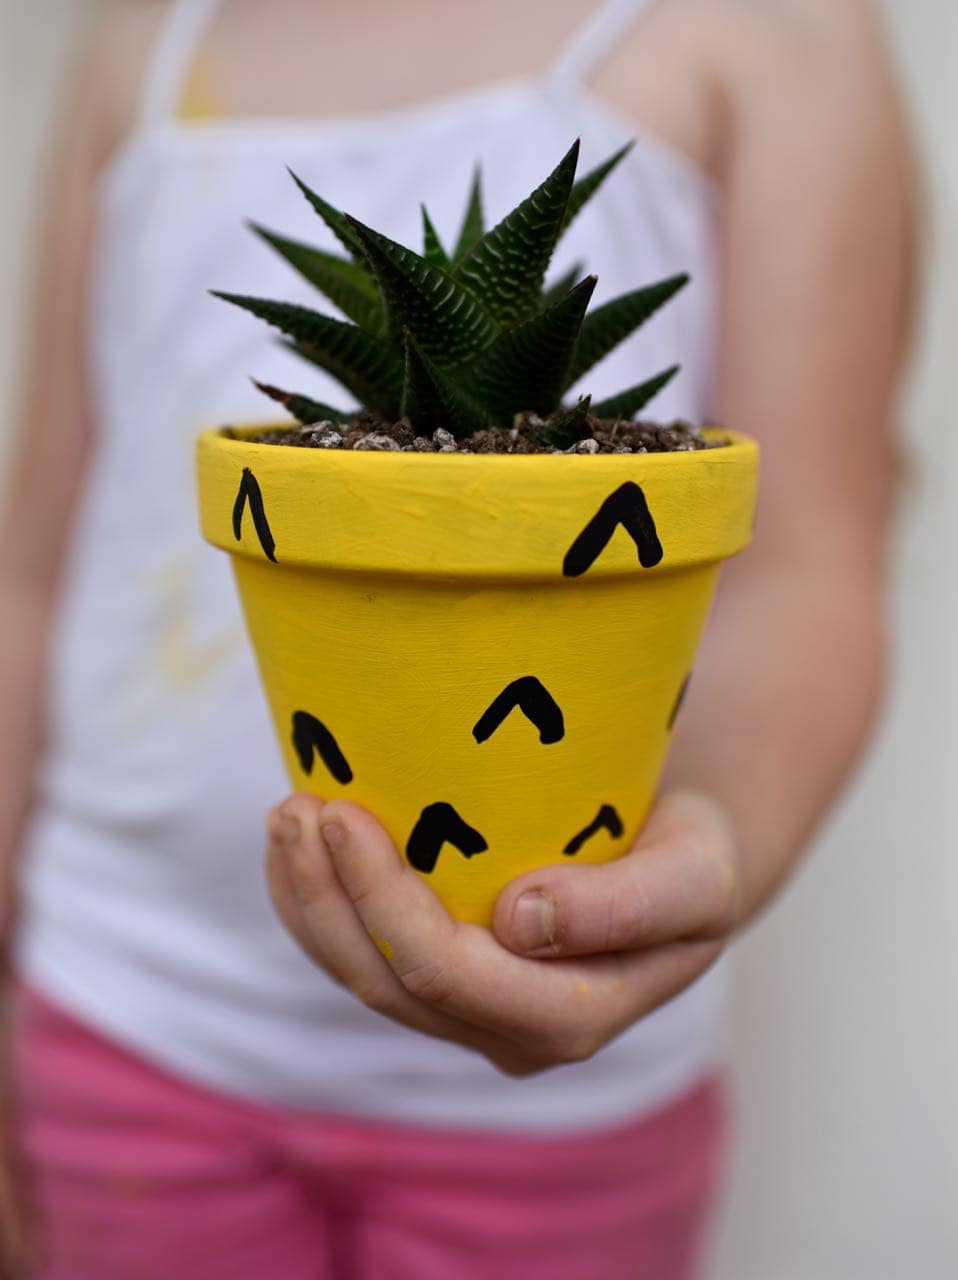 DIY Pineapple Planter Craft